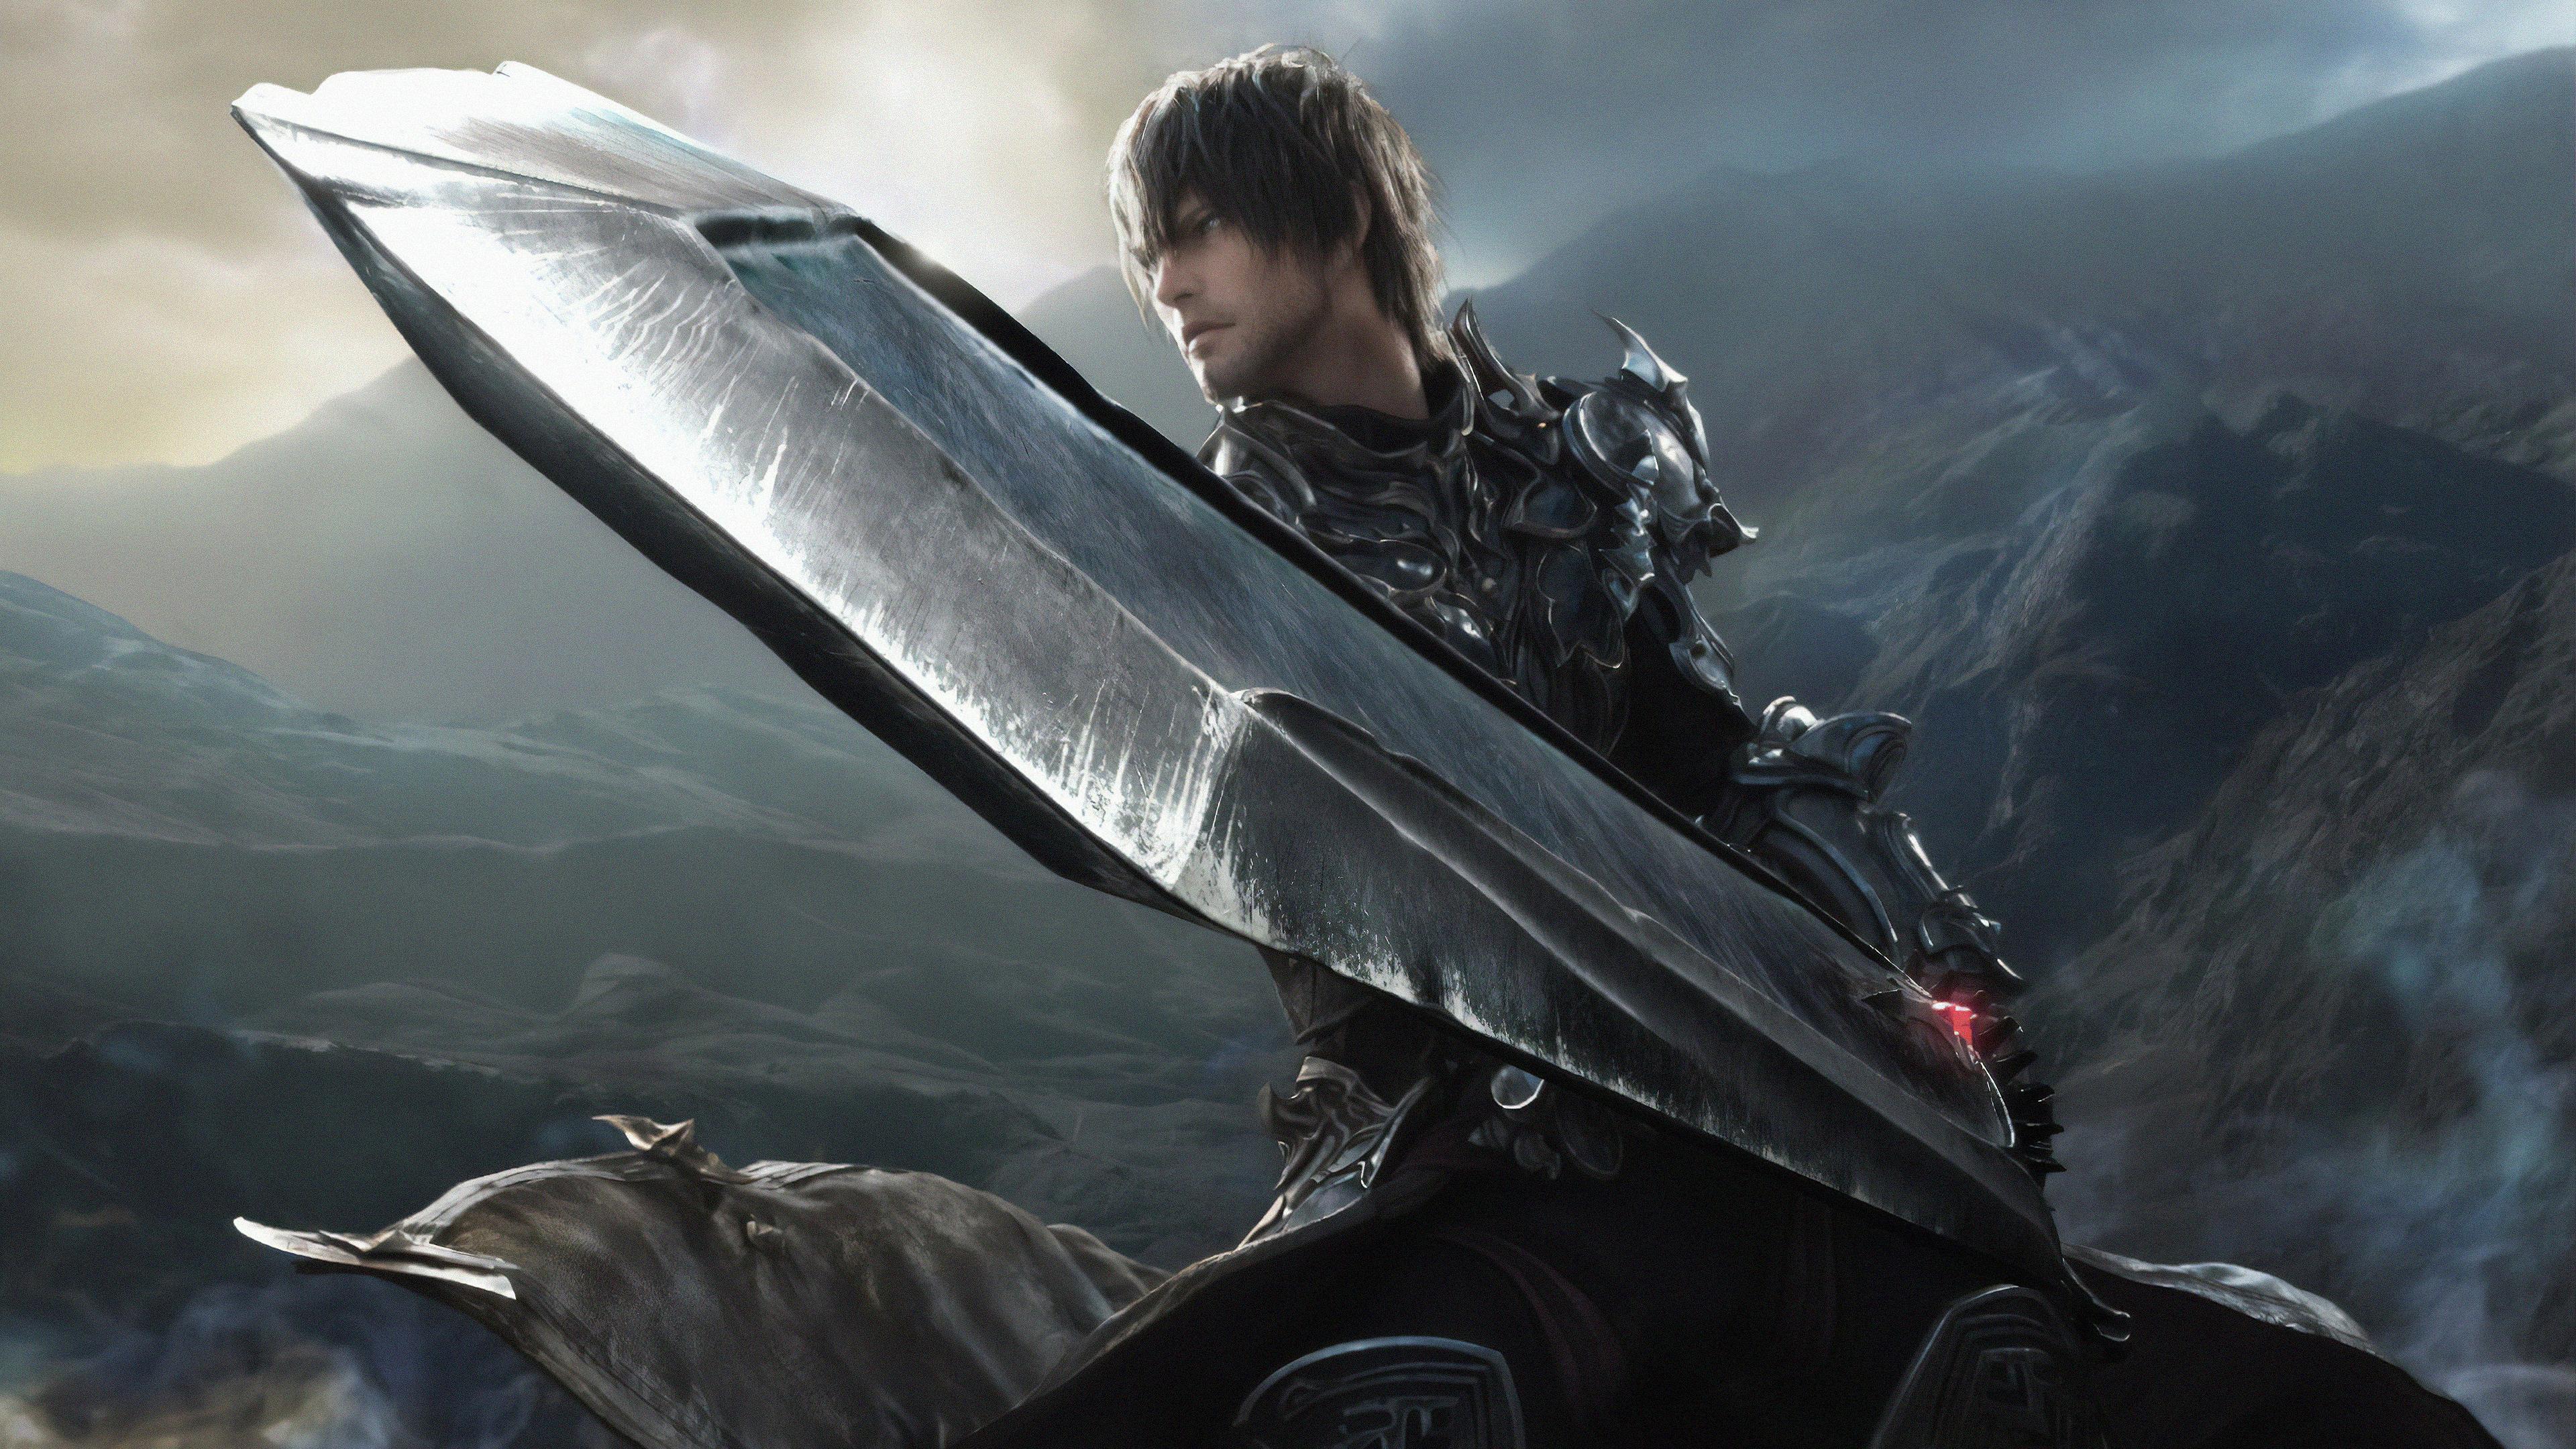 Final Fantasy Xiv Wallpaper Art